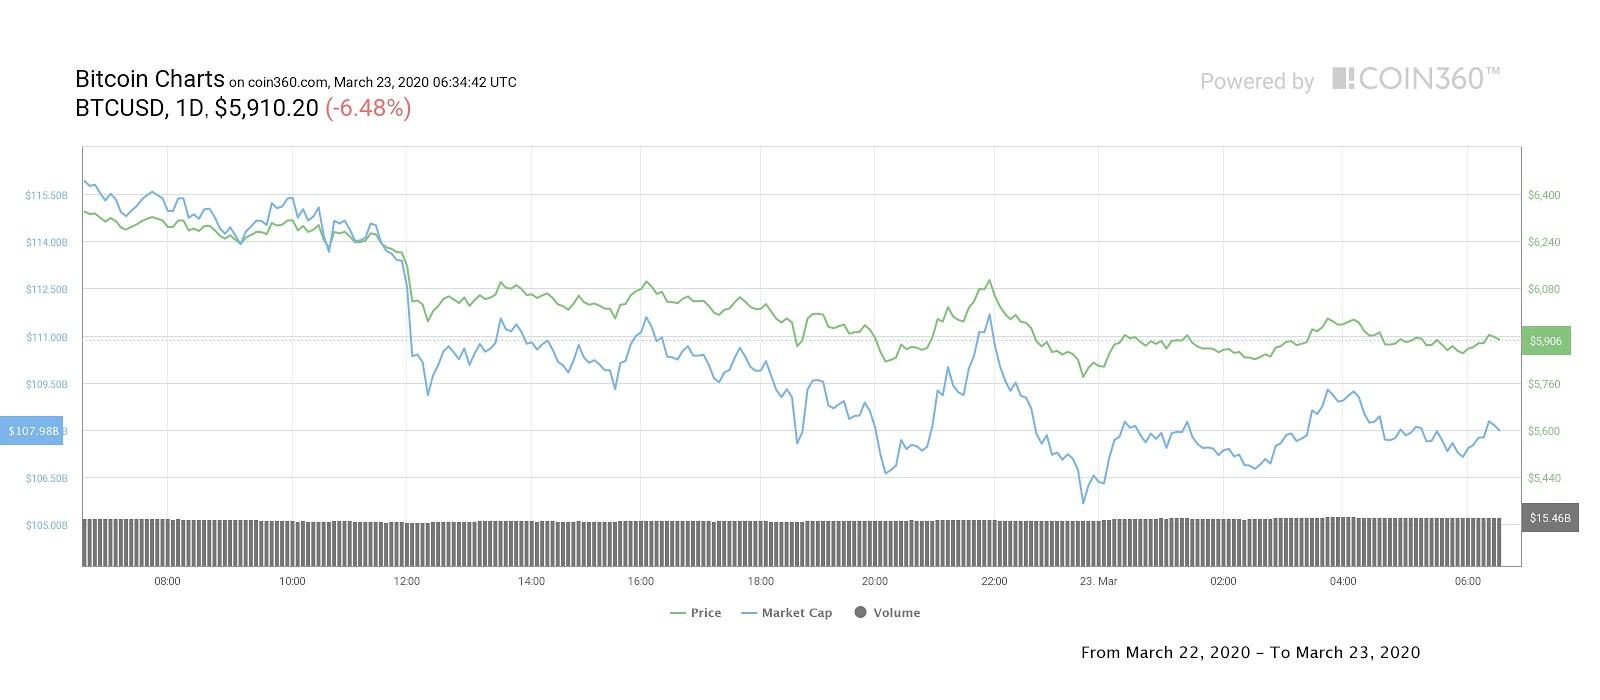 Bitcoin Tages-Kurschart